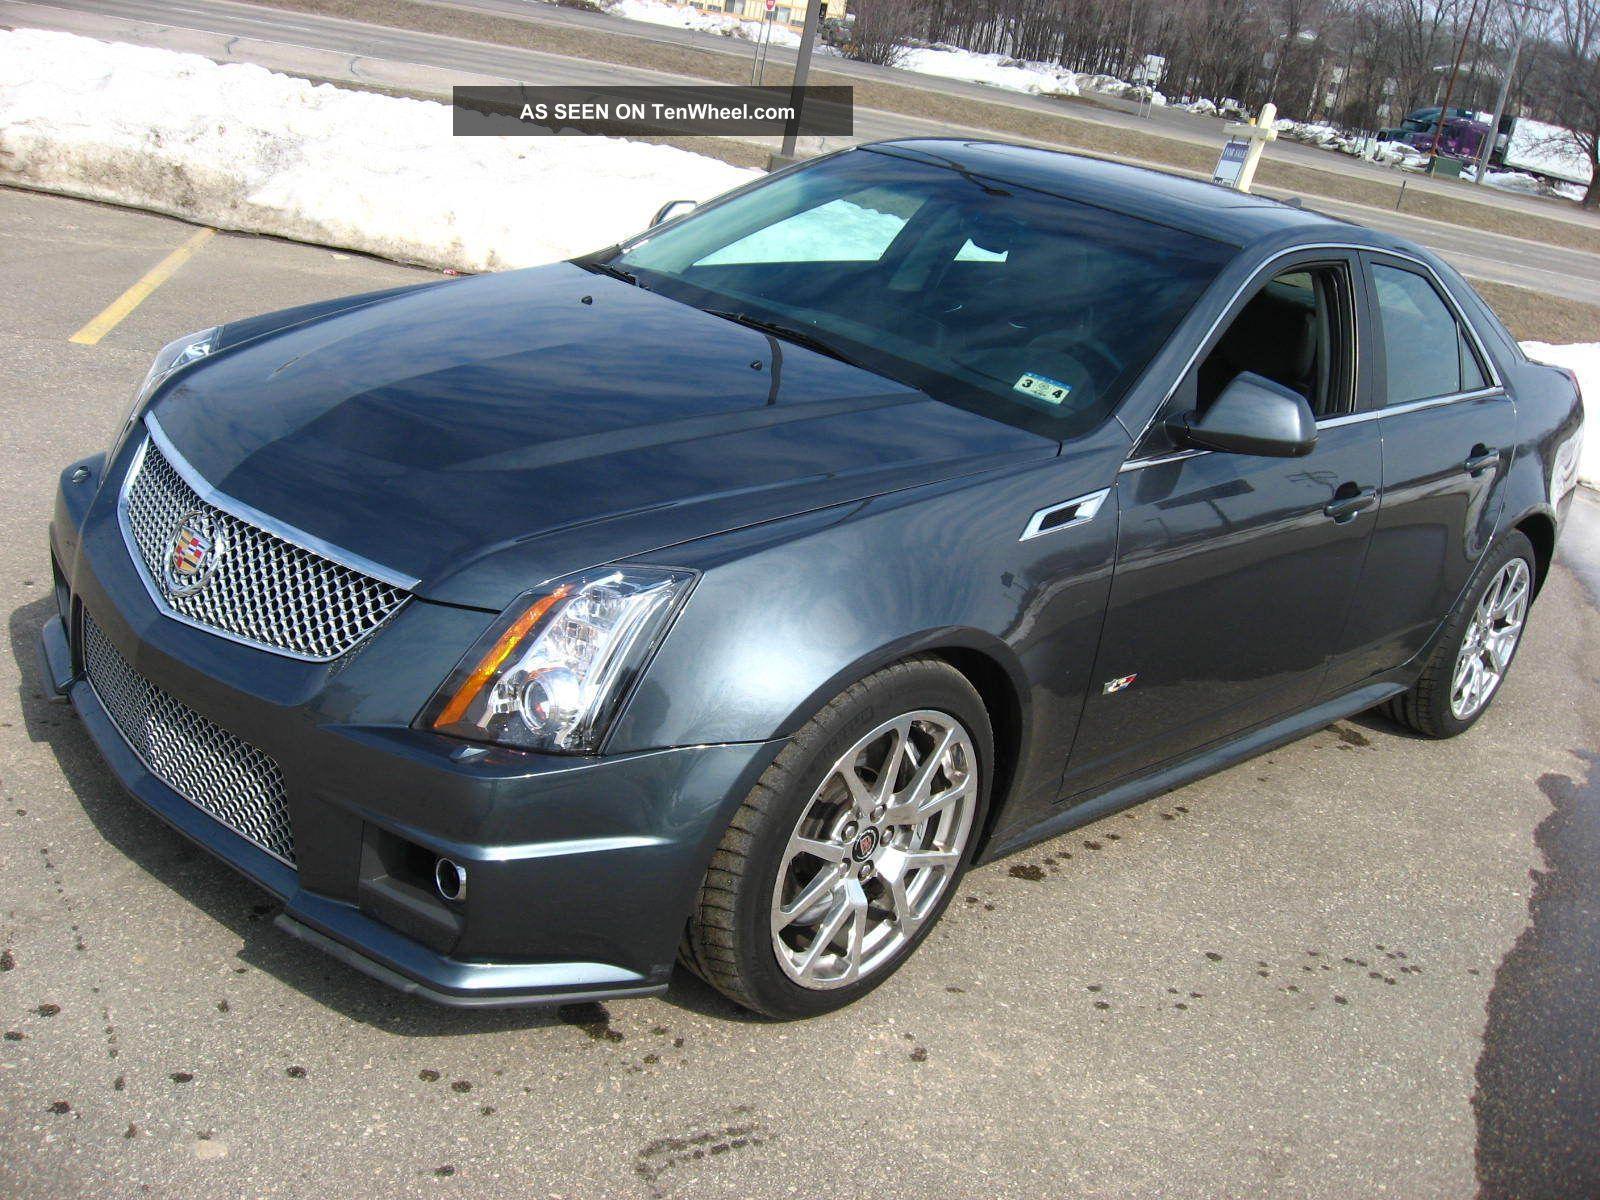 2011 Cadillac Cts V Ctsv Sedan Thunder Gray 556hp 6 2